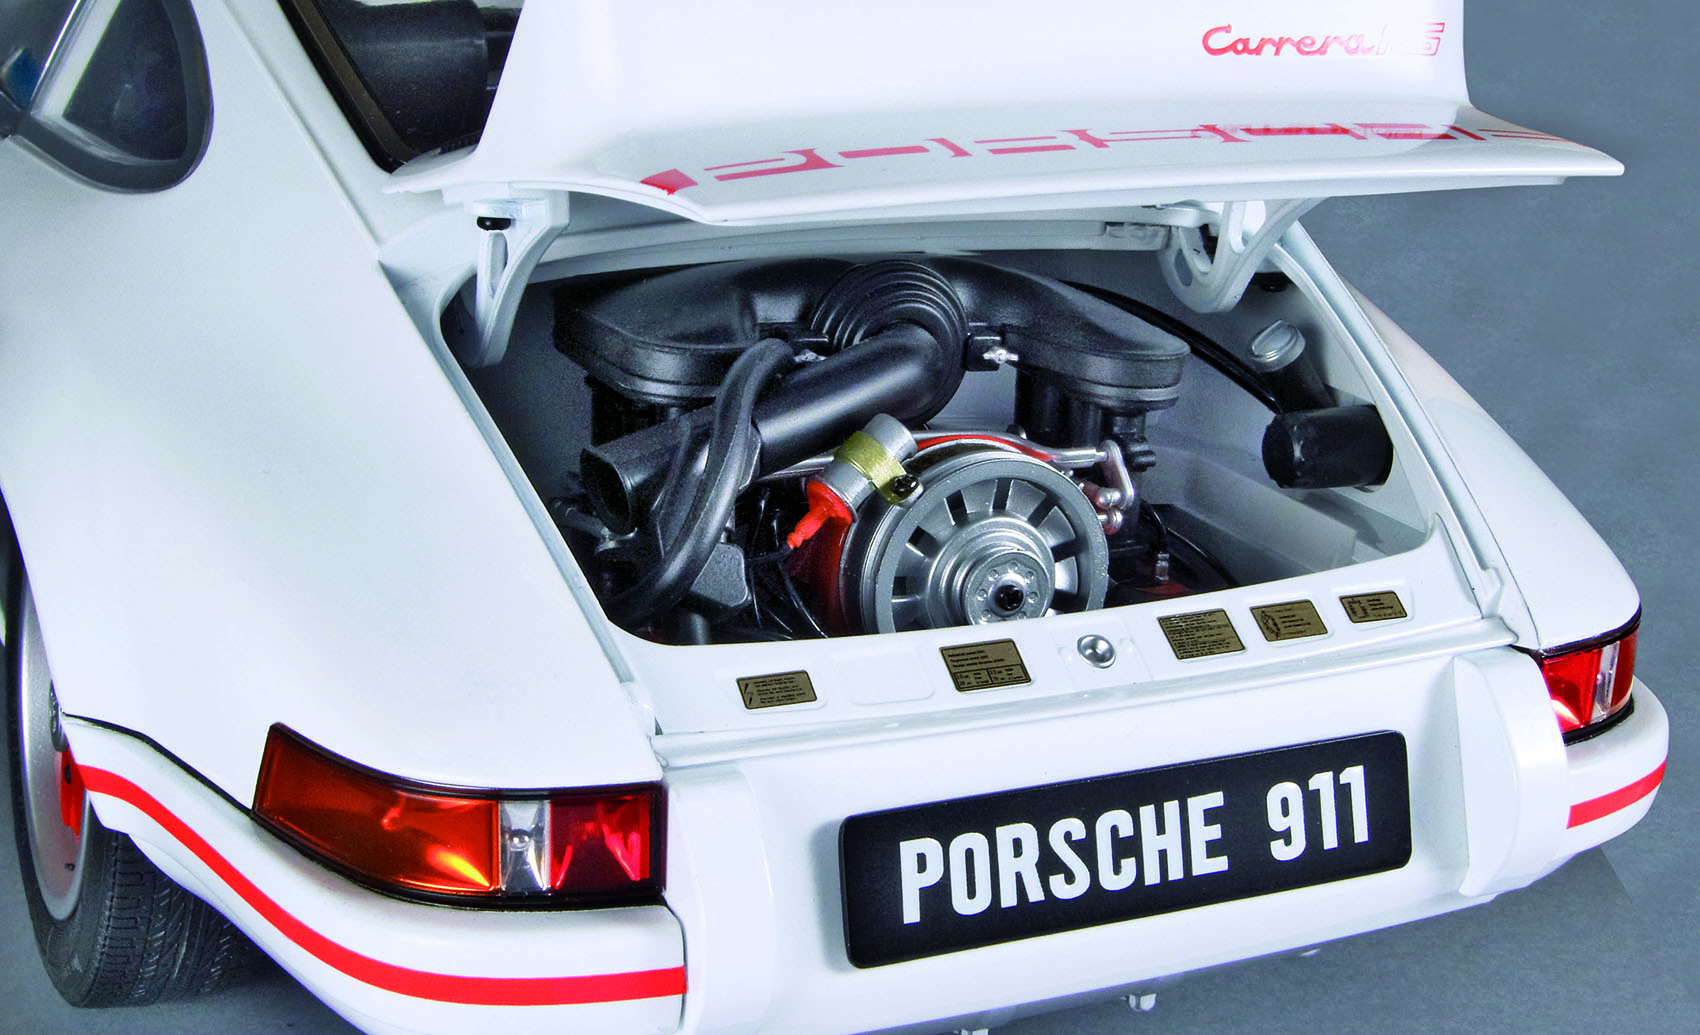 porsche-911 Carrera 911 RS 2.7